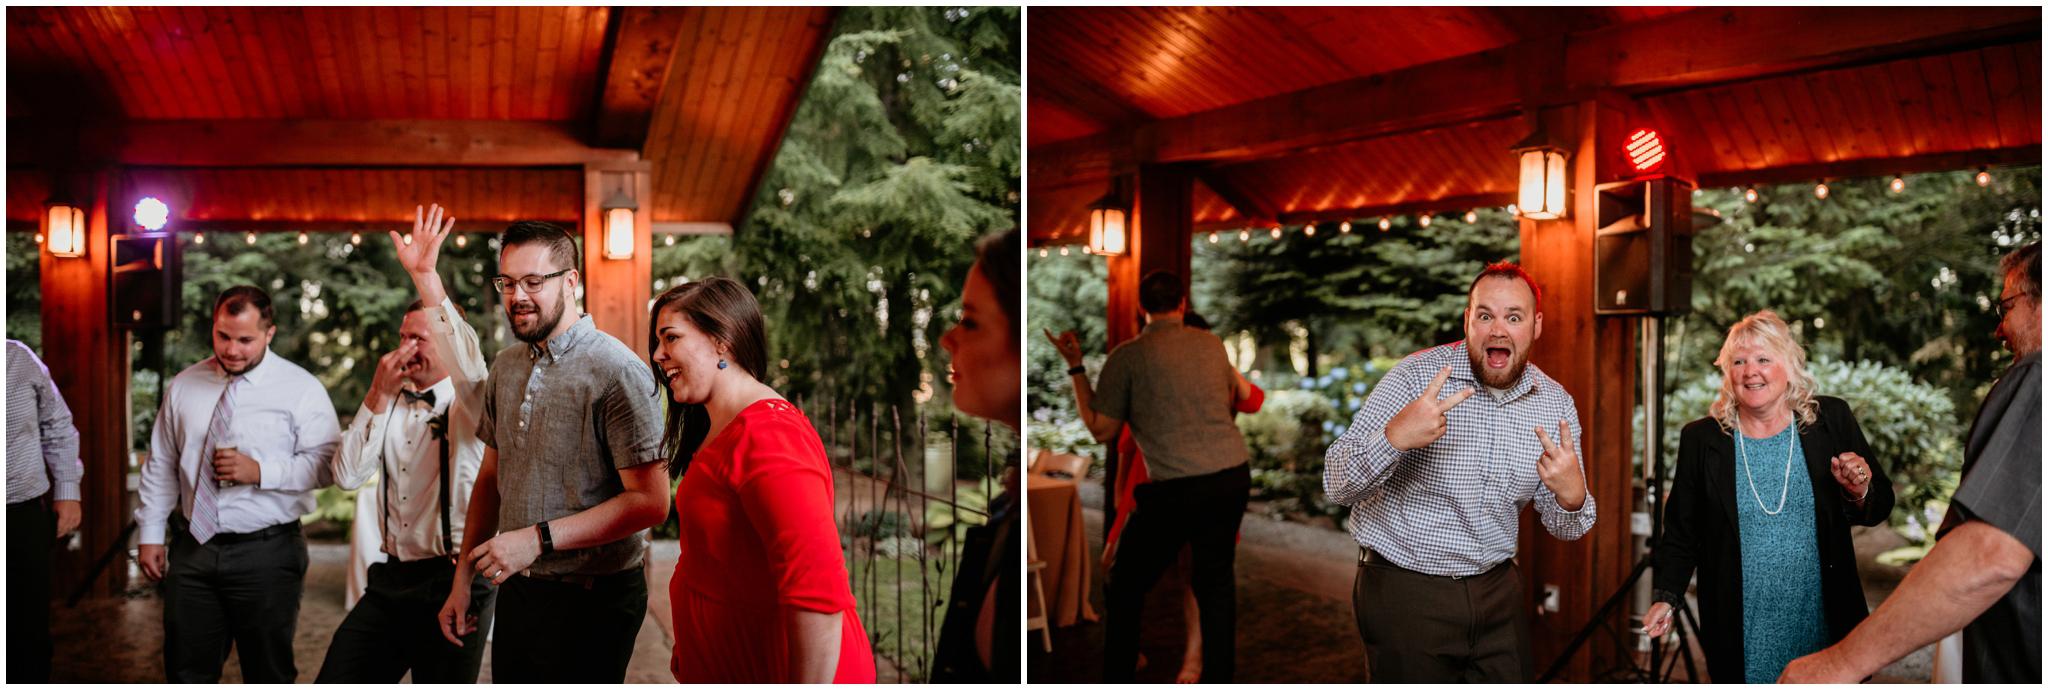 erin-and-tyler-evergreen-gardens-bellingham-wedding-photographer-139.jpg